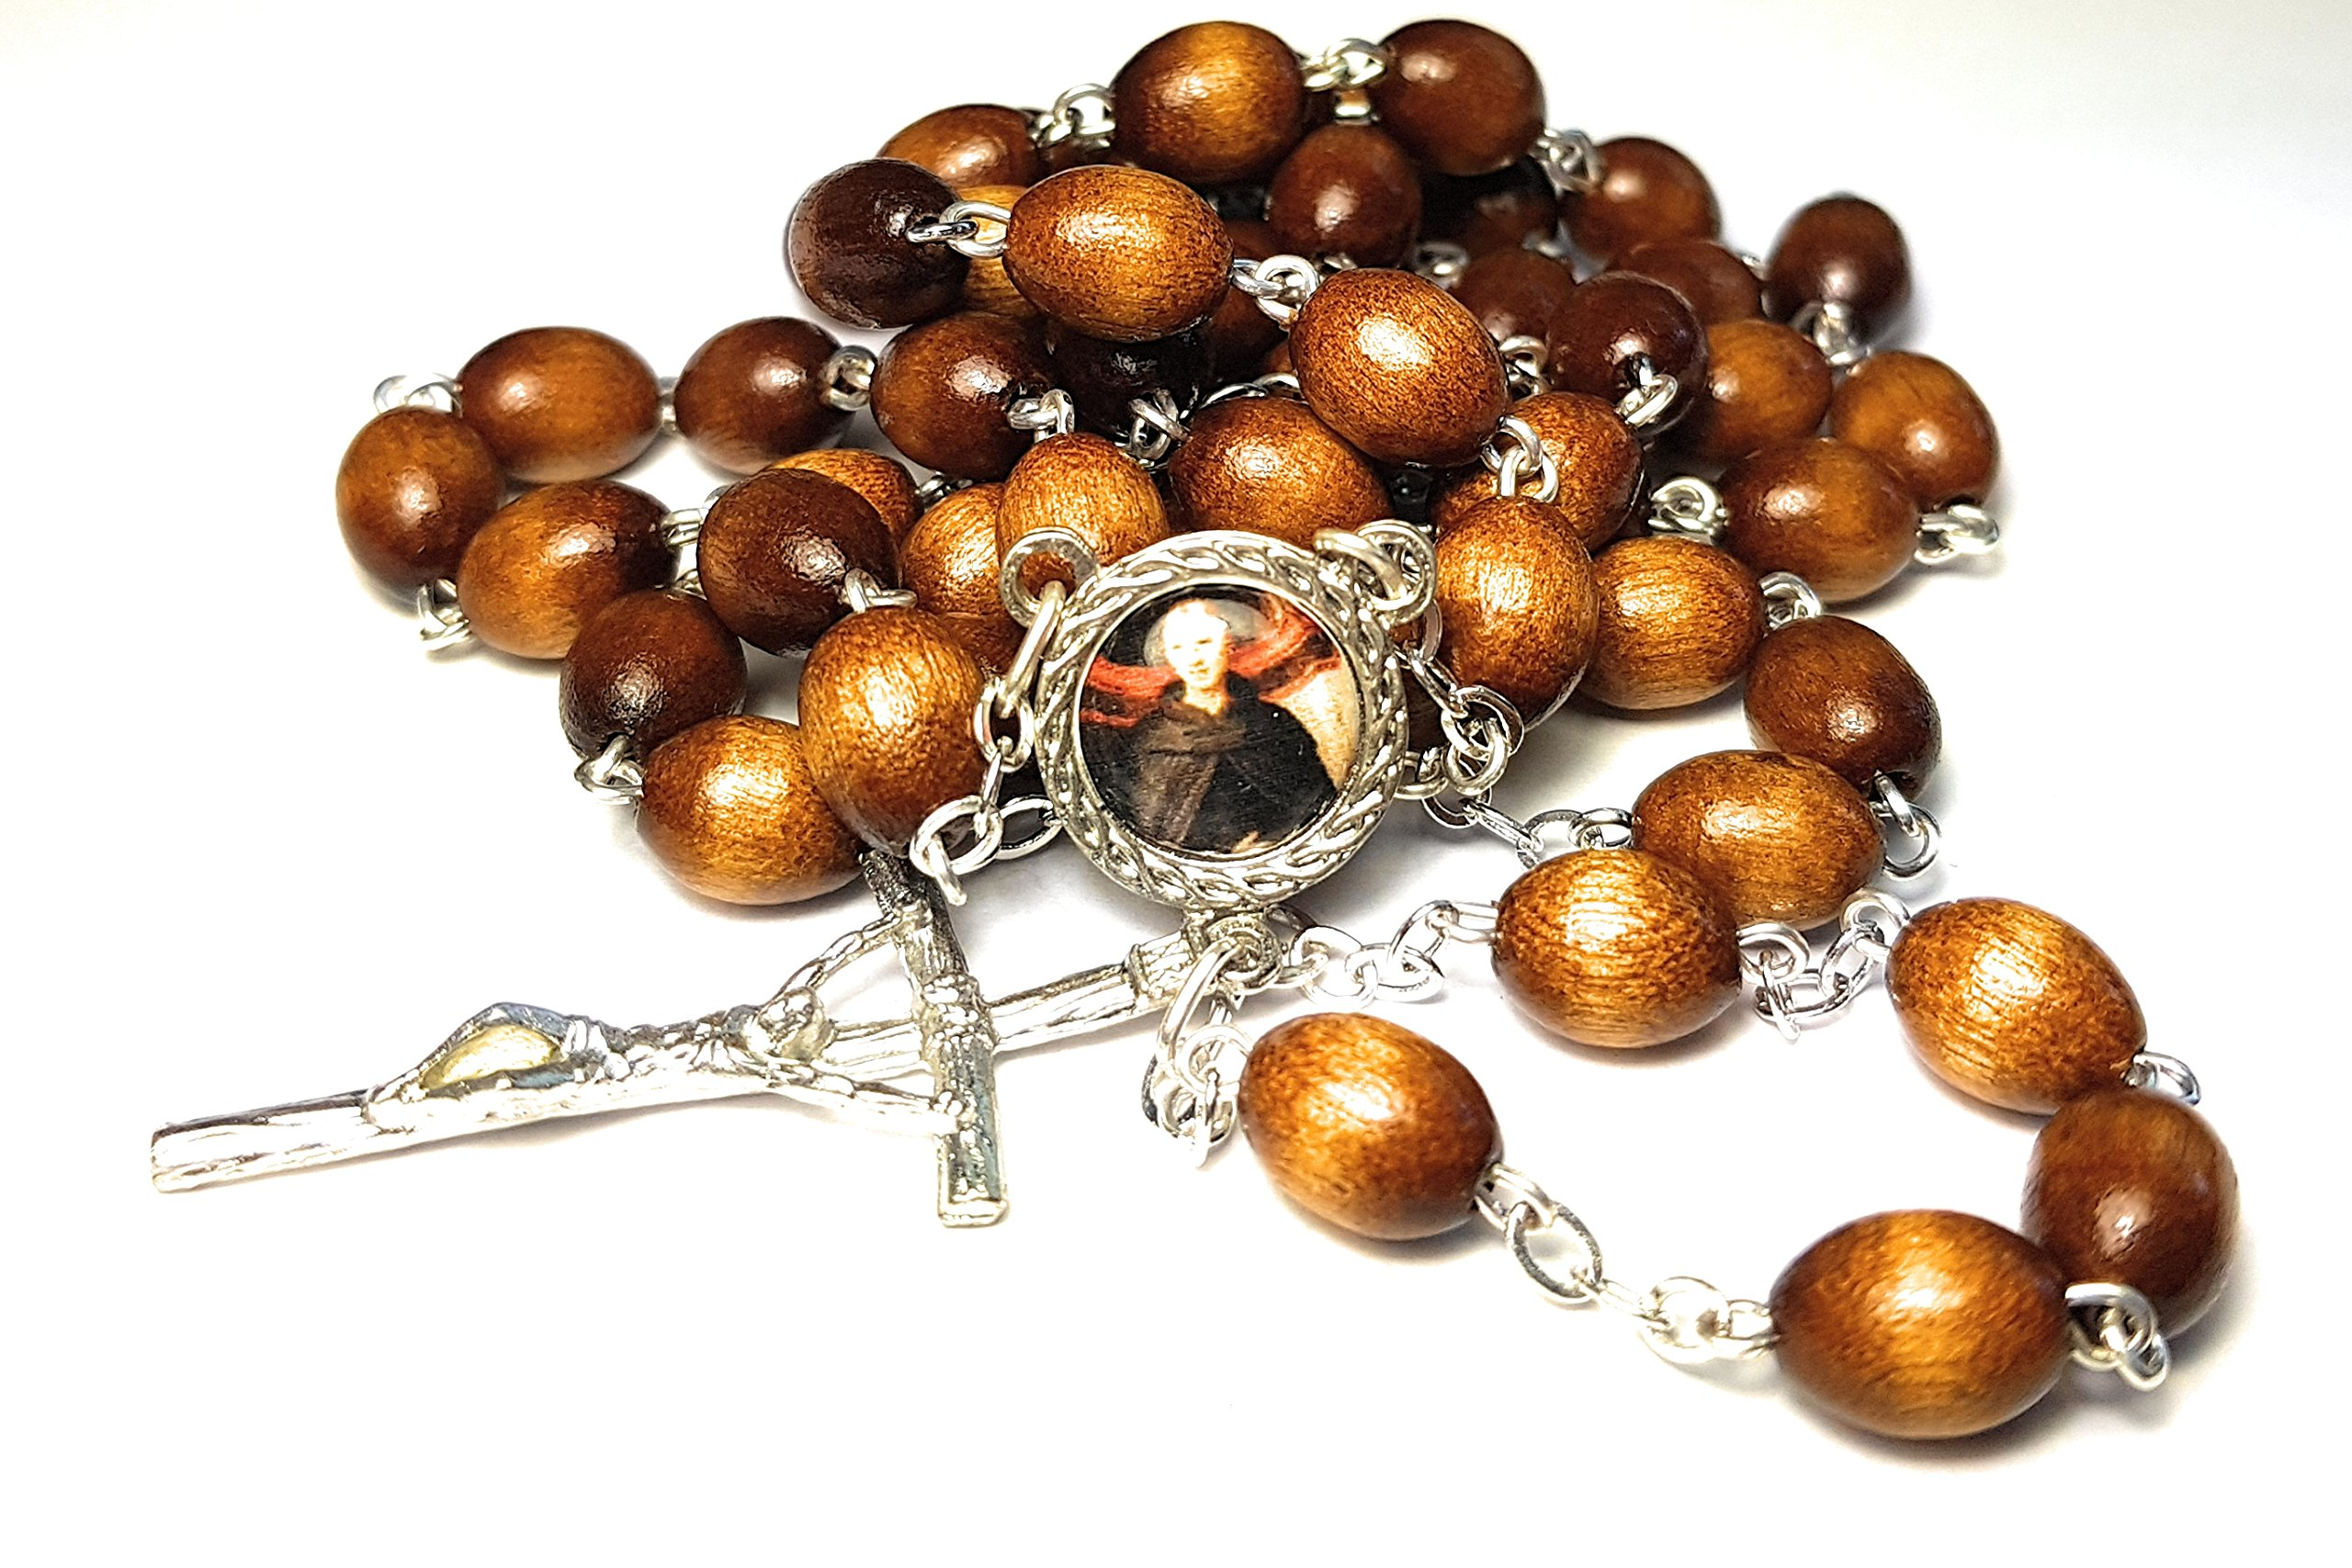 Relic Rosary 3rd class of Saint Nicholas of Tolentino patron of animals; babies; boatmen; souls in purgatory, Philippines San Nicolás de Tolentino sacerdote, místico católico italiano (Brown)